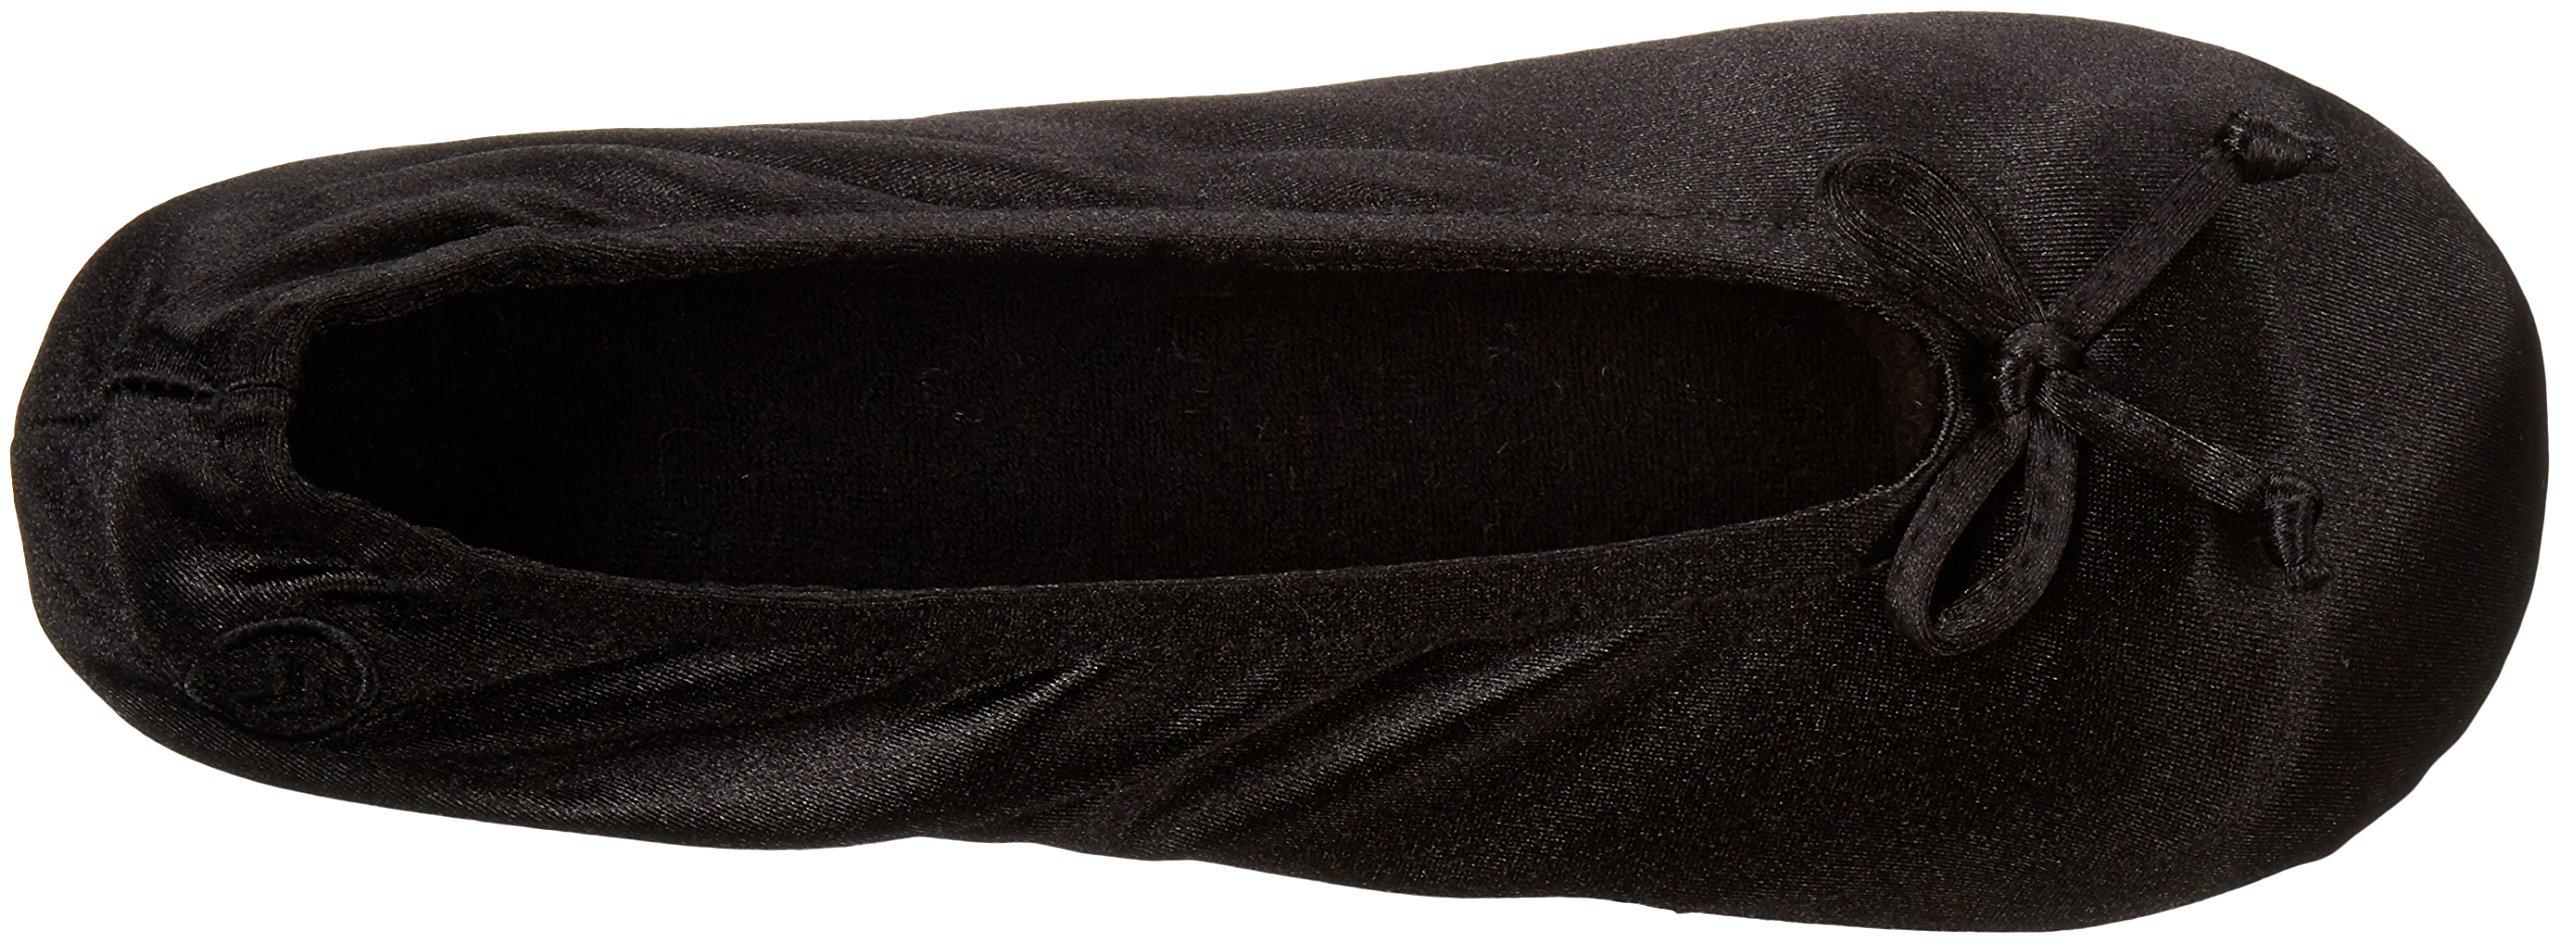 ISOTONER Women's Satin Ballerina Slipper, Black, Large/8-9 M US by ISOTONER (Image #10)